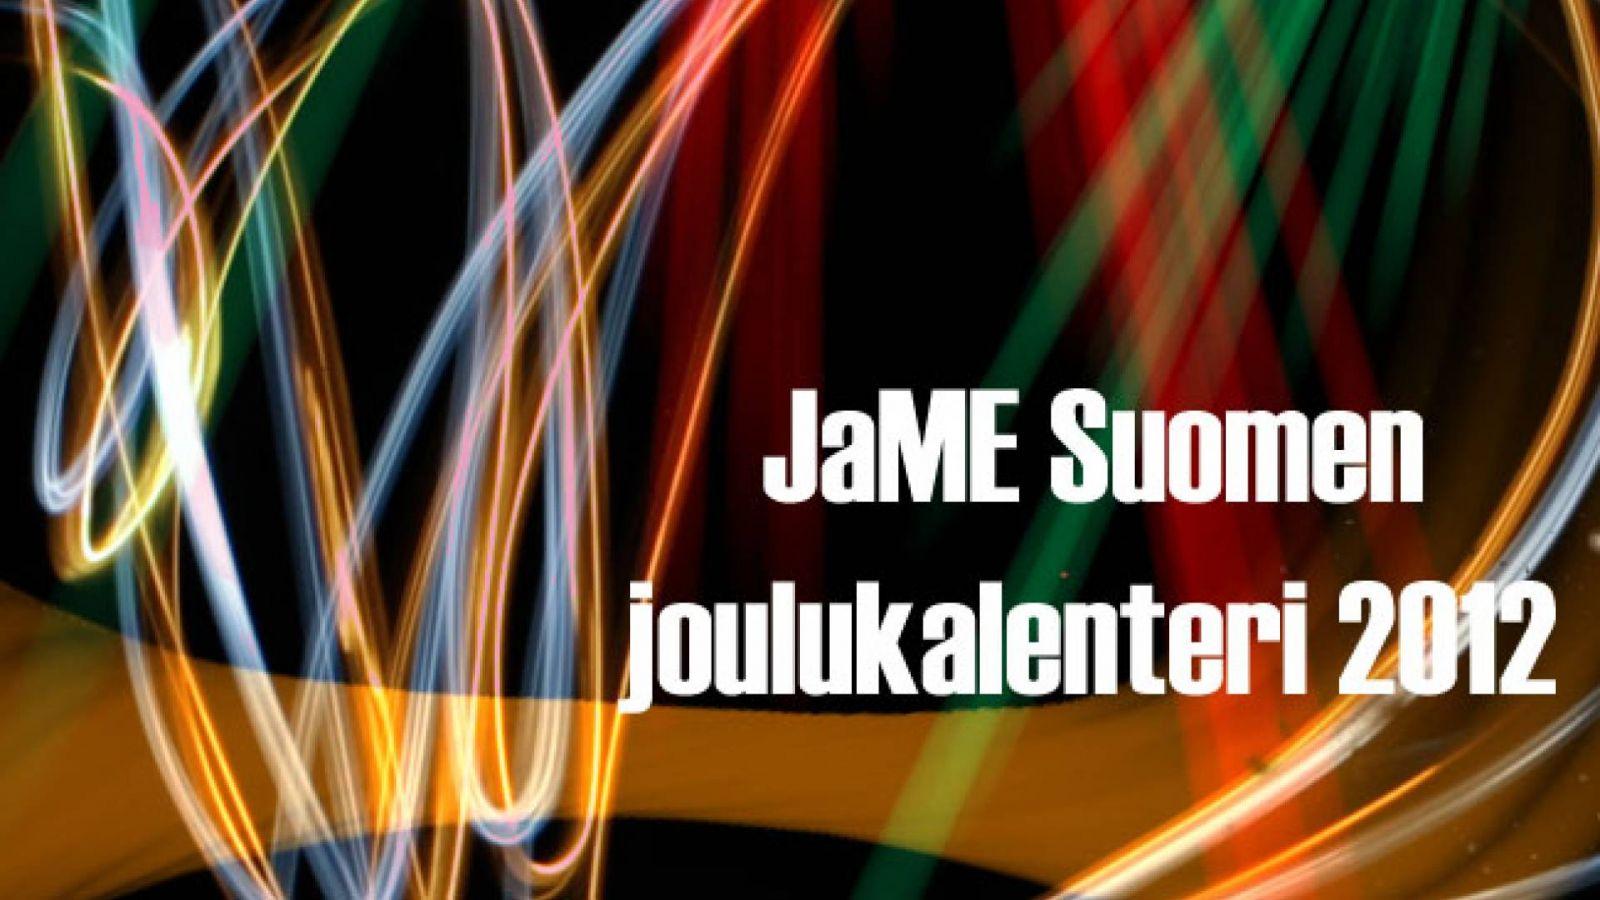 JaME Suomen joulukalenteri: 8. luukku © rreichu, JaME Suomi